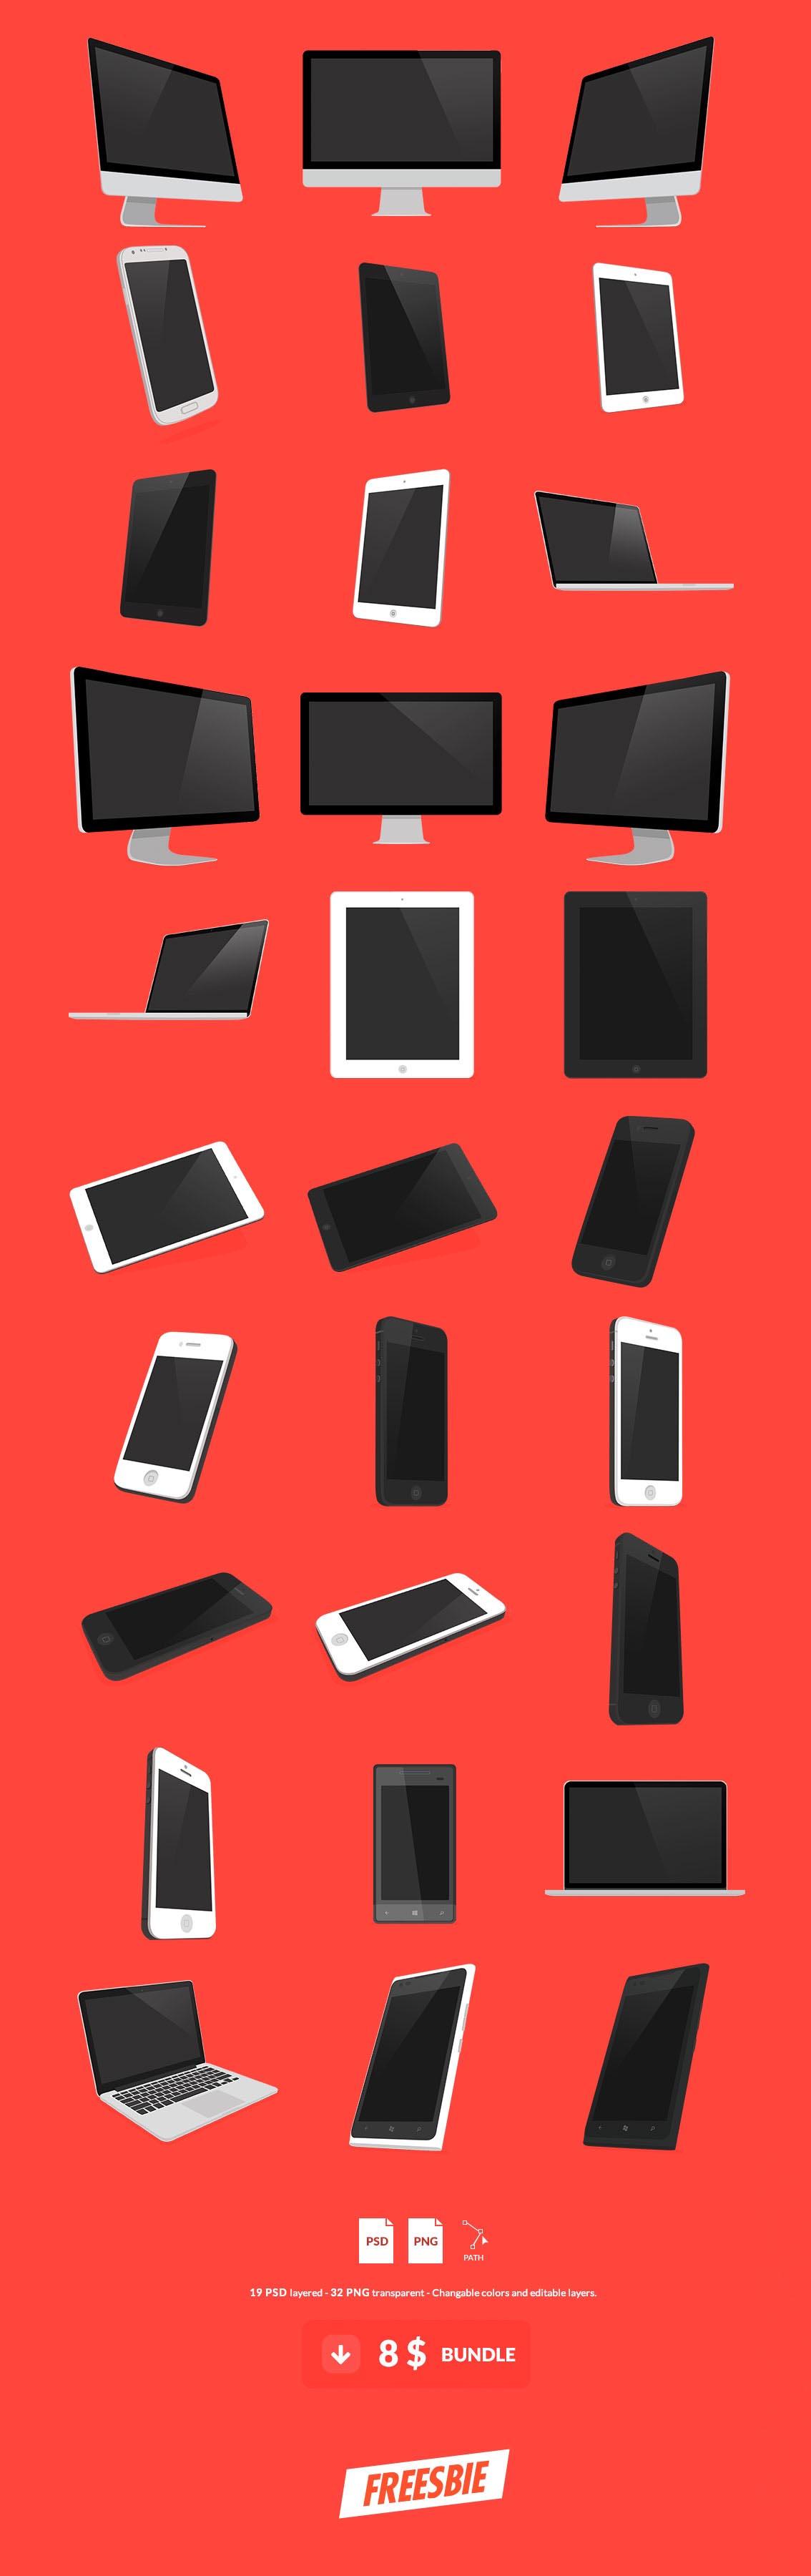 Flat UI 3D PSD Mockup Kit iPad iMac iPhone Android Nokia Windows Mobile